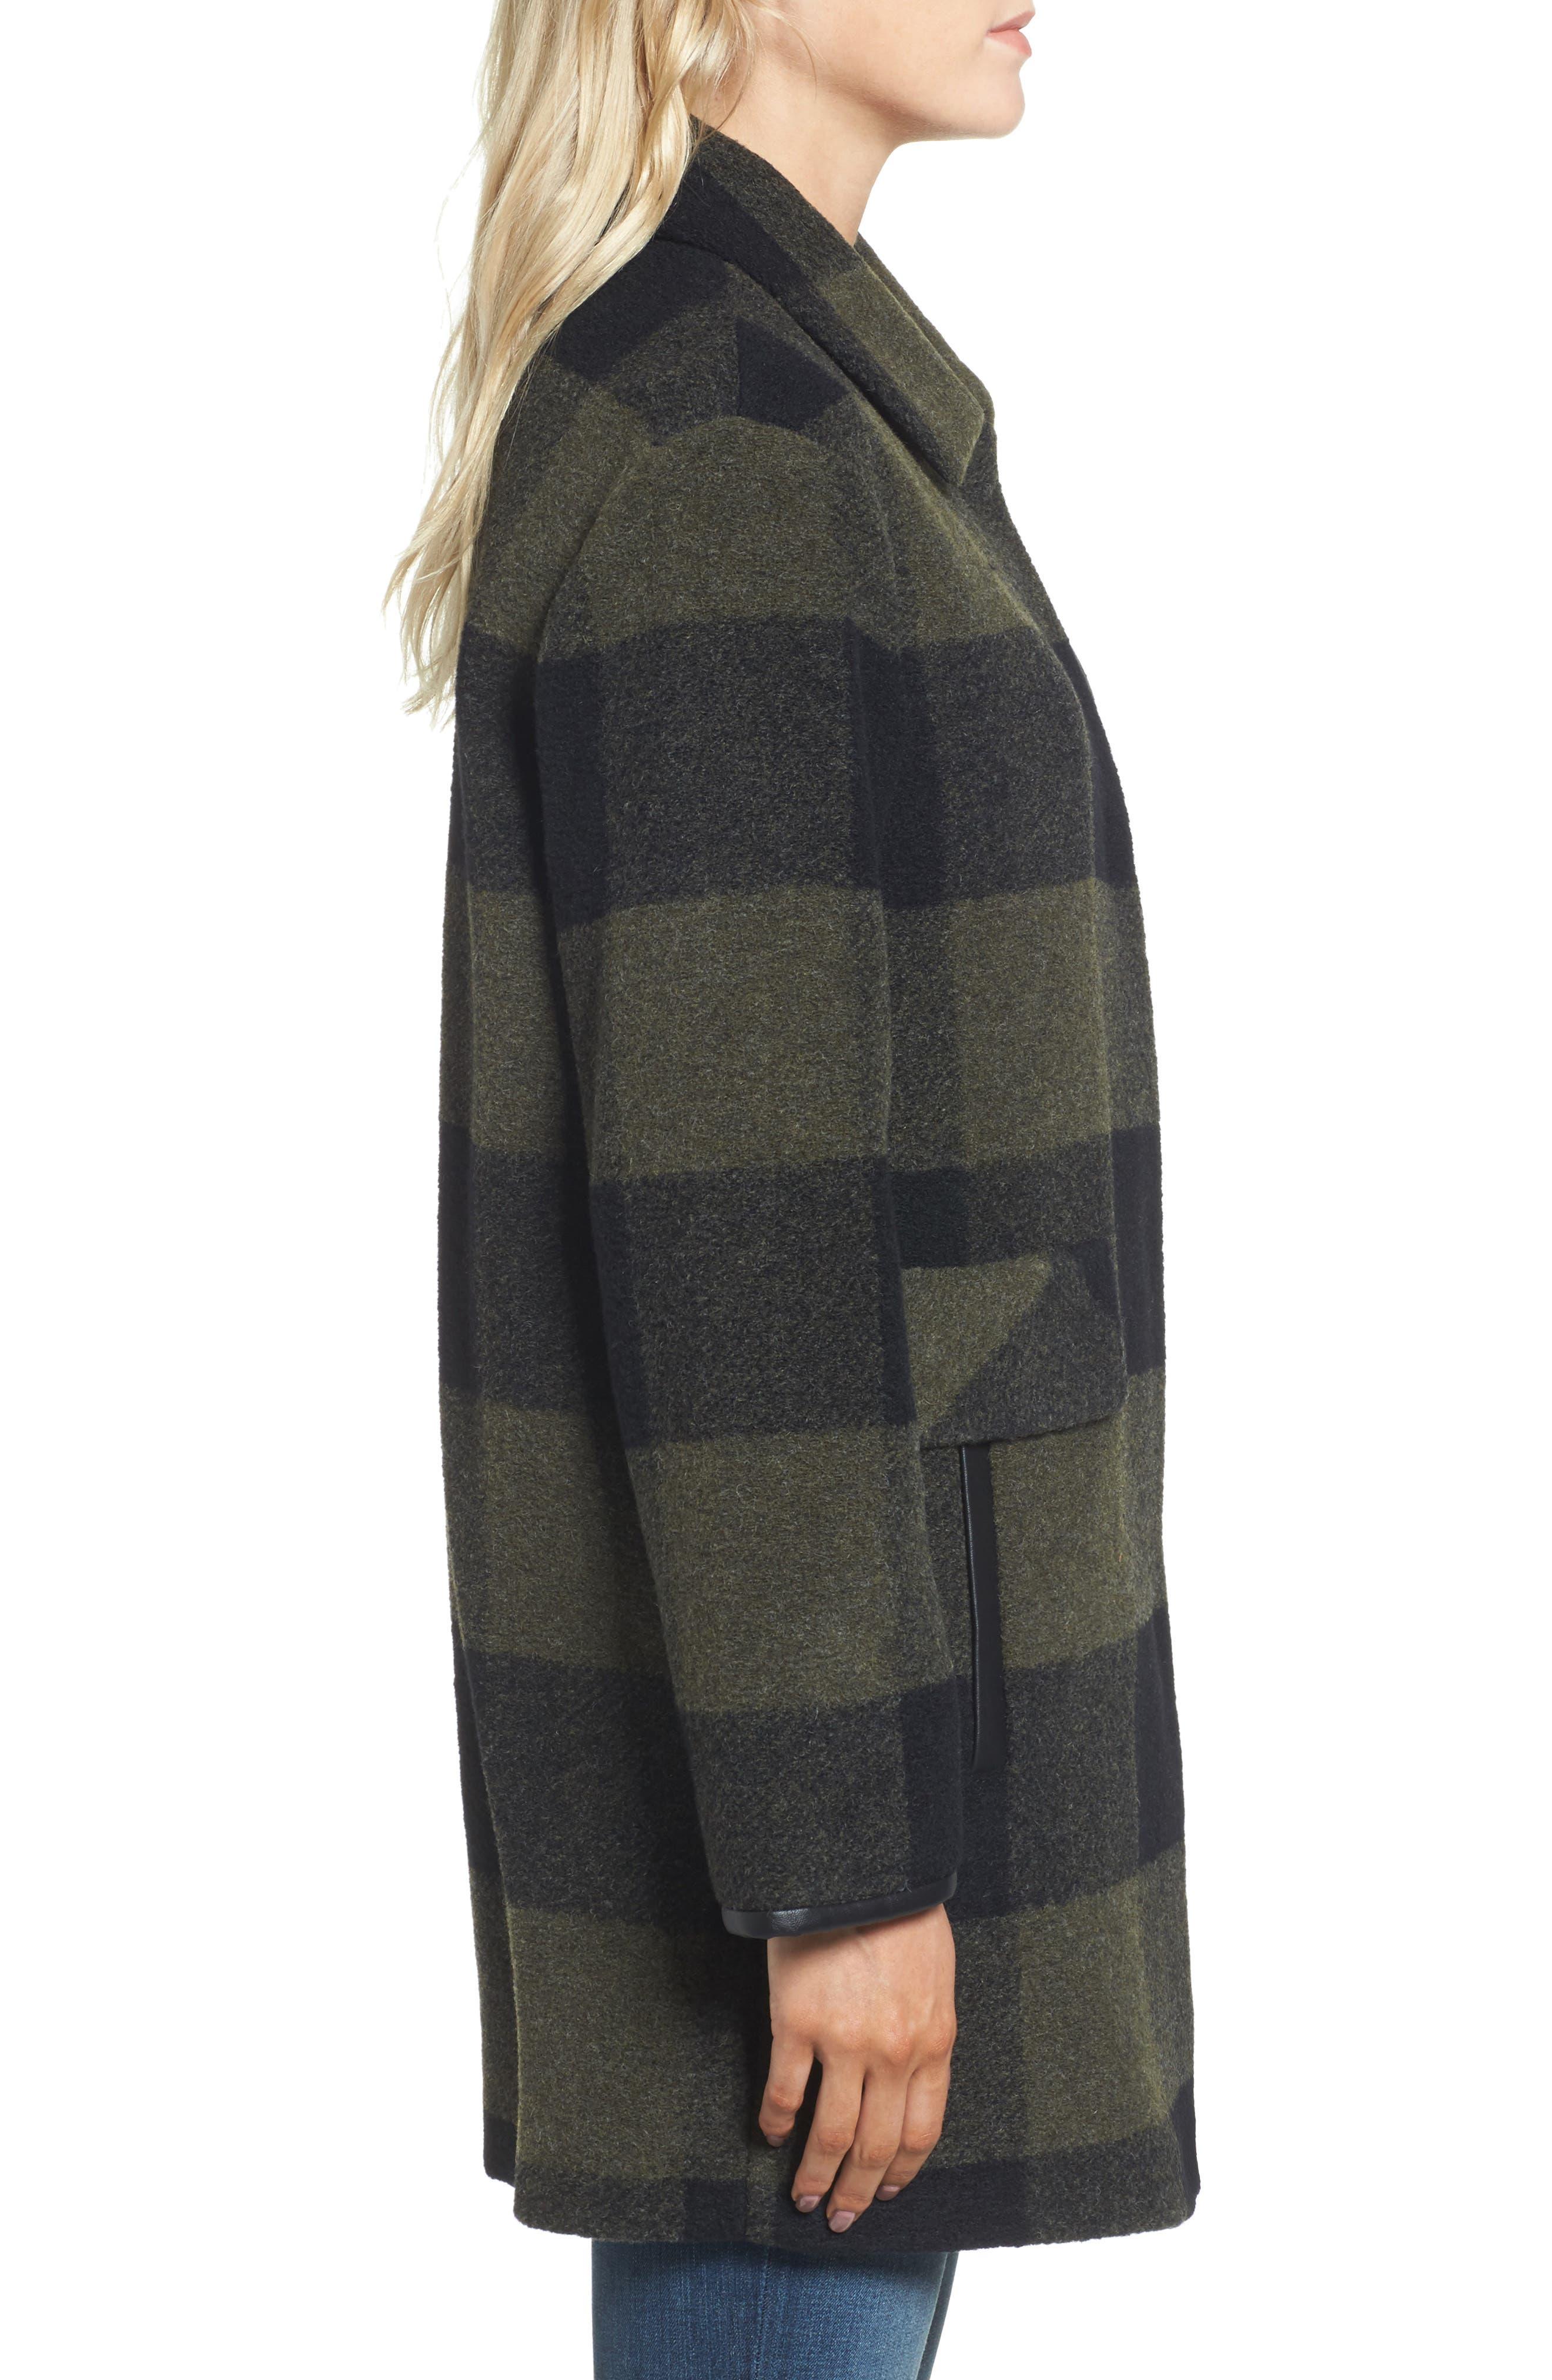 Paul Bunyan Plaid Wool Blend Barn Coat,                             Alternate thumbnail 3, color,                             Olive/ Black Plaid